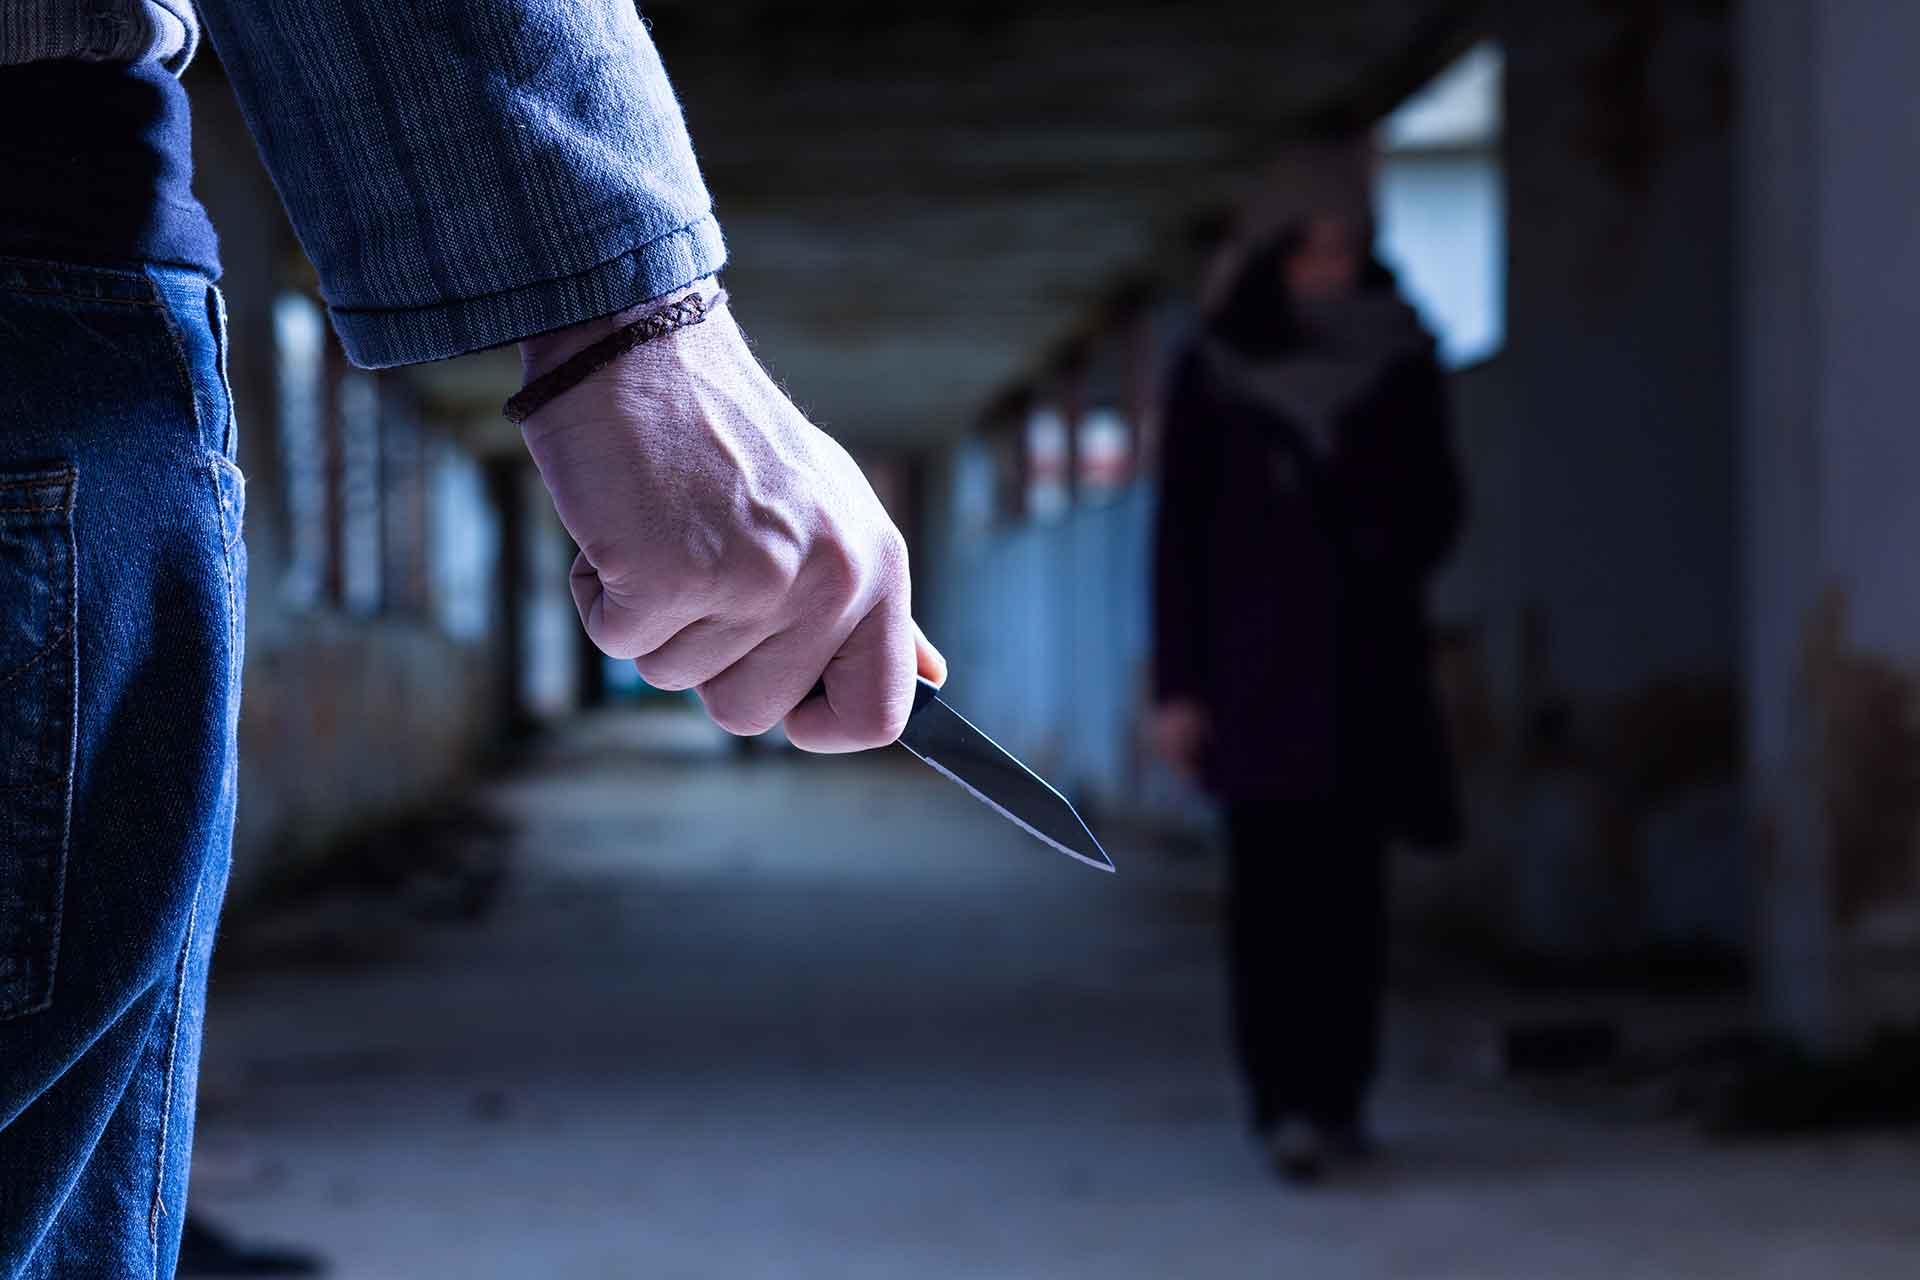 Spraakmakende strafzaken - Moord Lajevardi